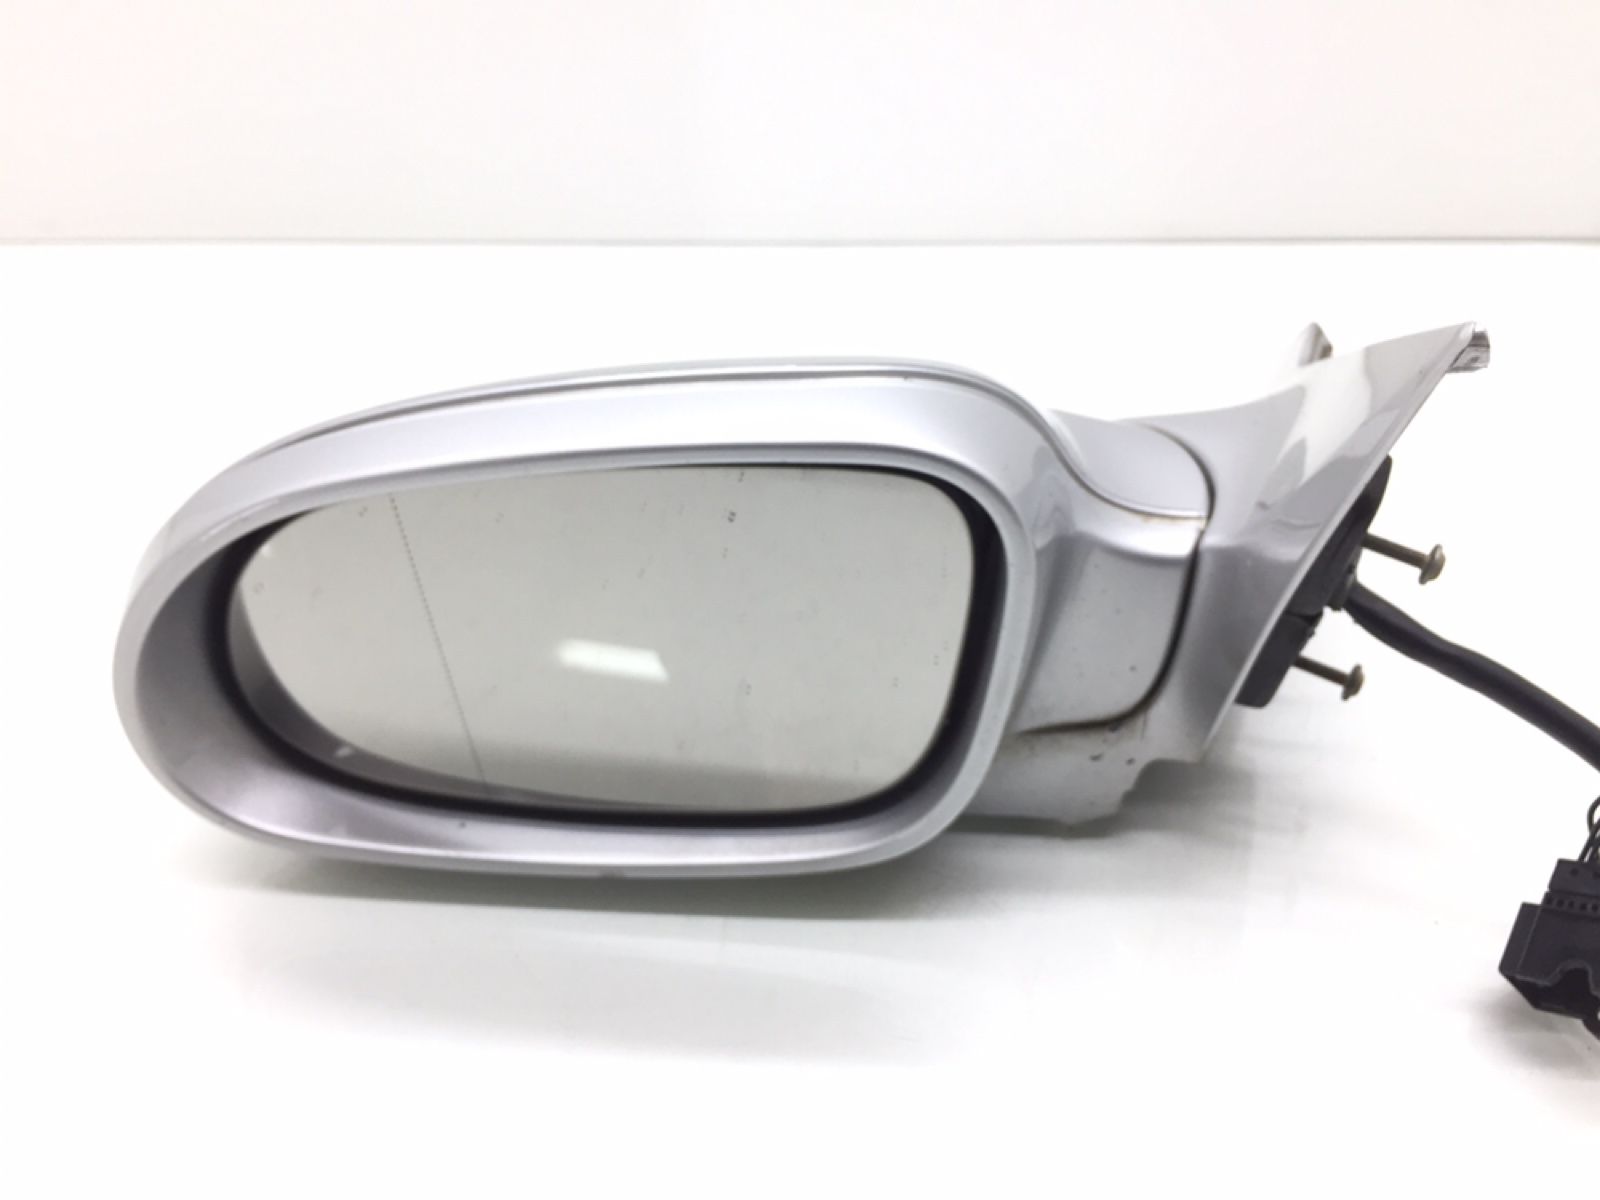 Зеркало наружное левое Mercedes Clk W209 2.7 CDI 2003 (б/у)